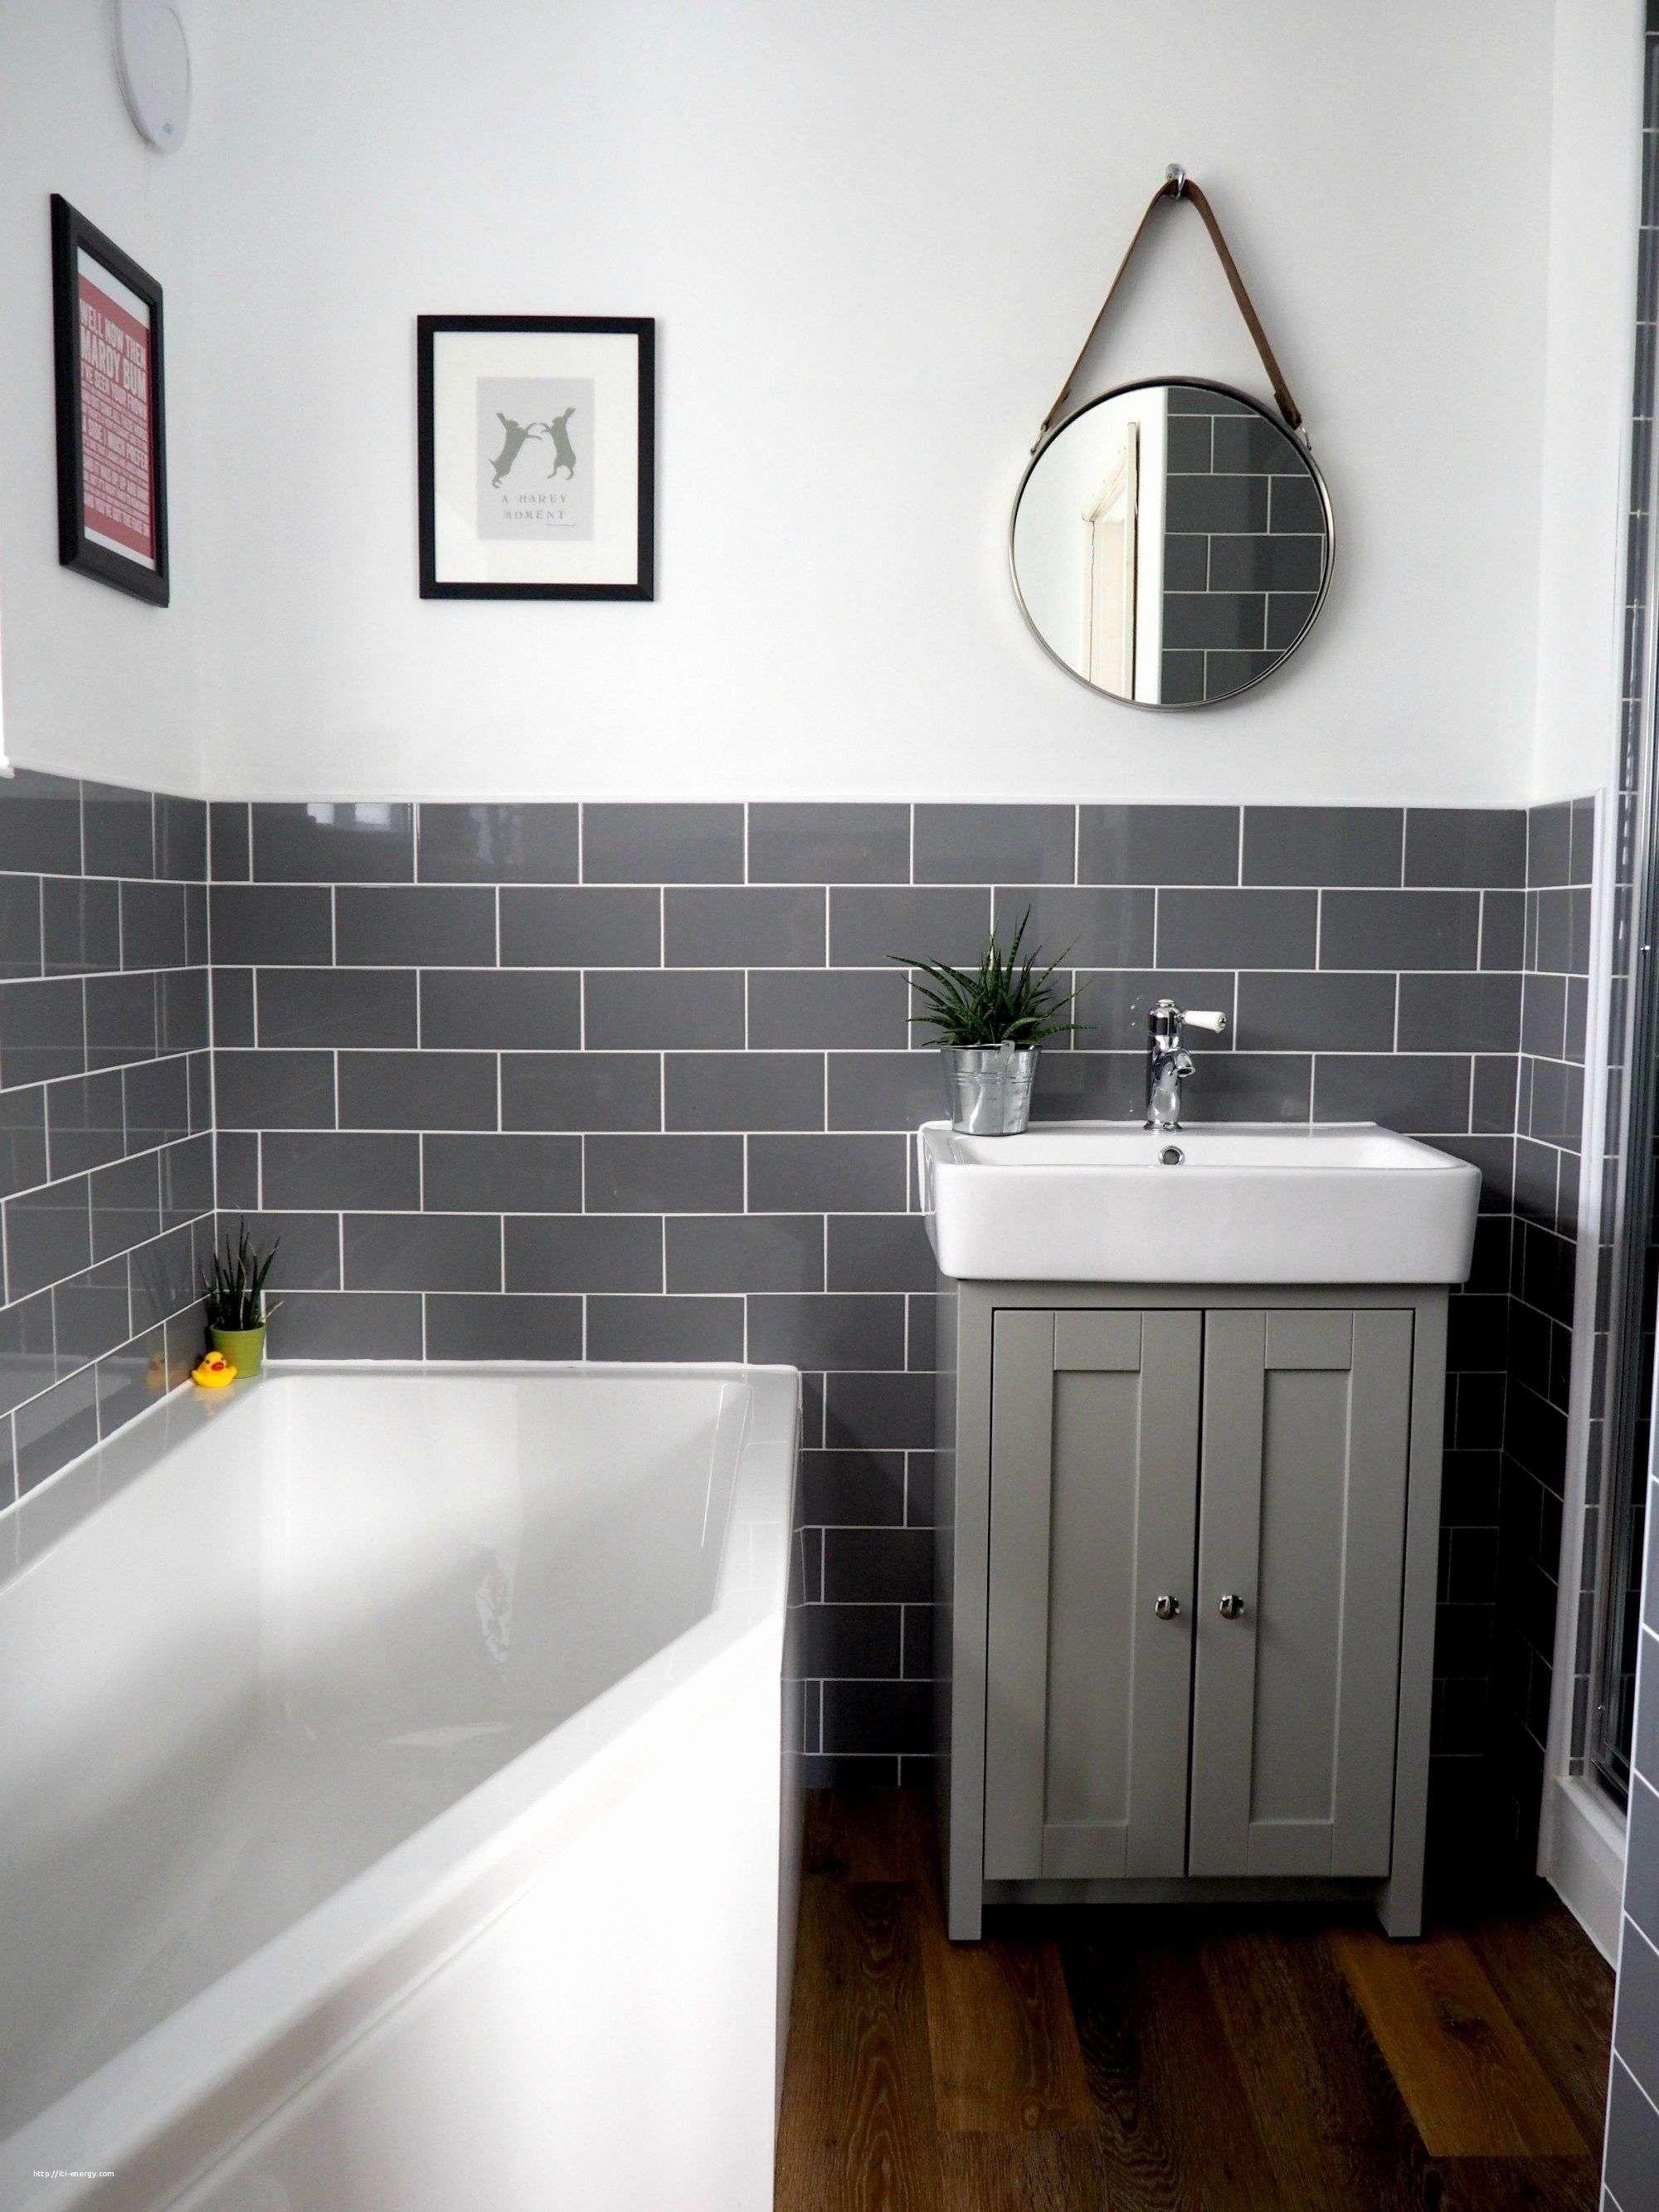 Basement Bathroom Color Ideas Bathroomideasforbasement Basement Bathroom Building Codes So You T Bathroom Remodel Cost Simple Bathroom Bathroom Design Small